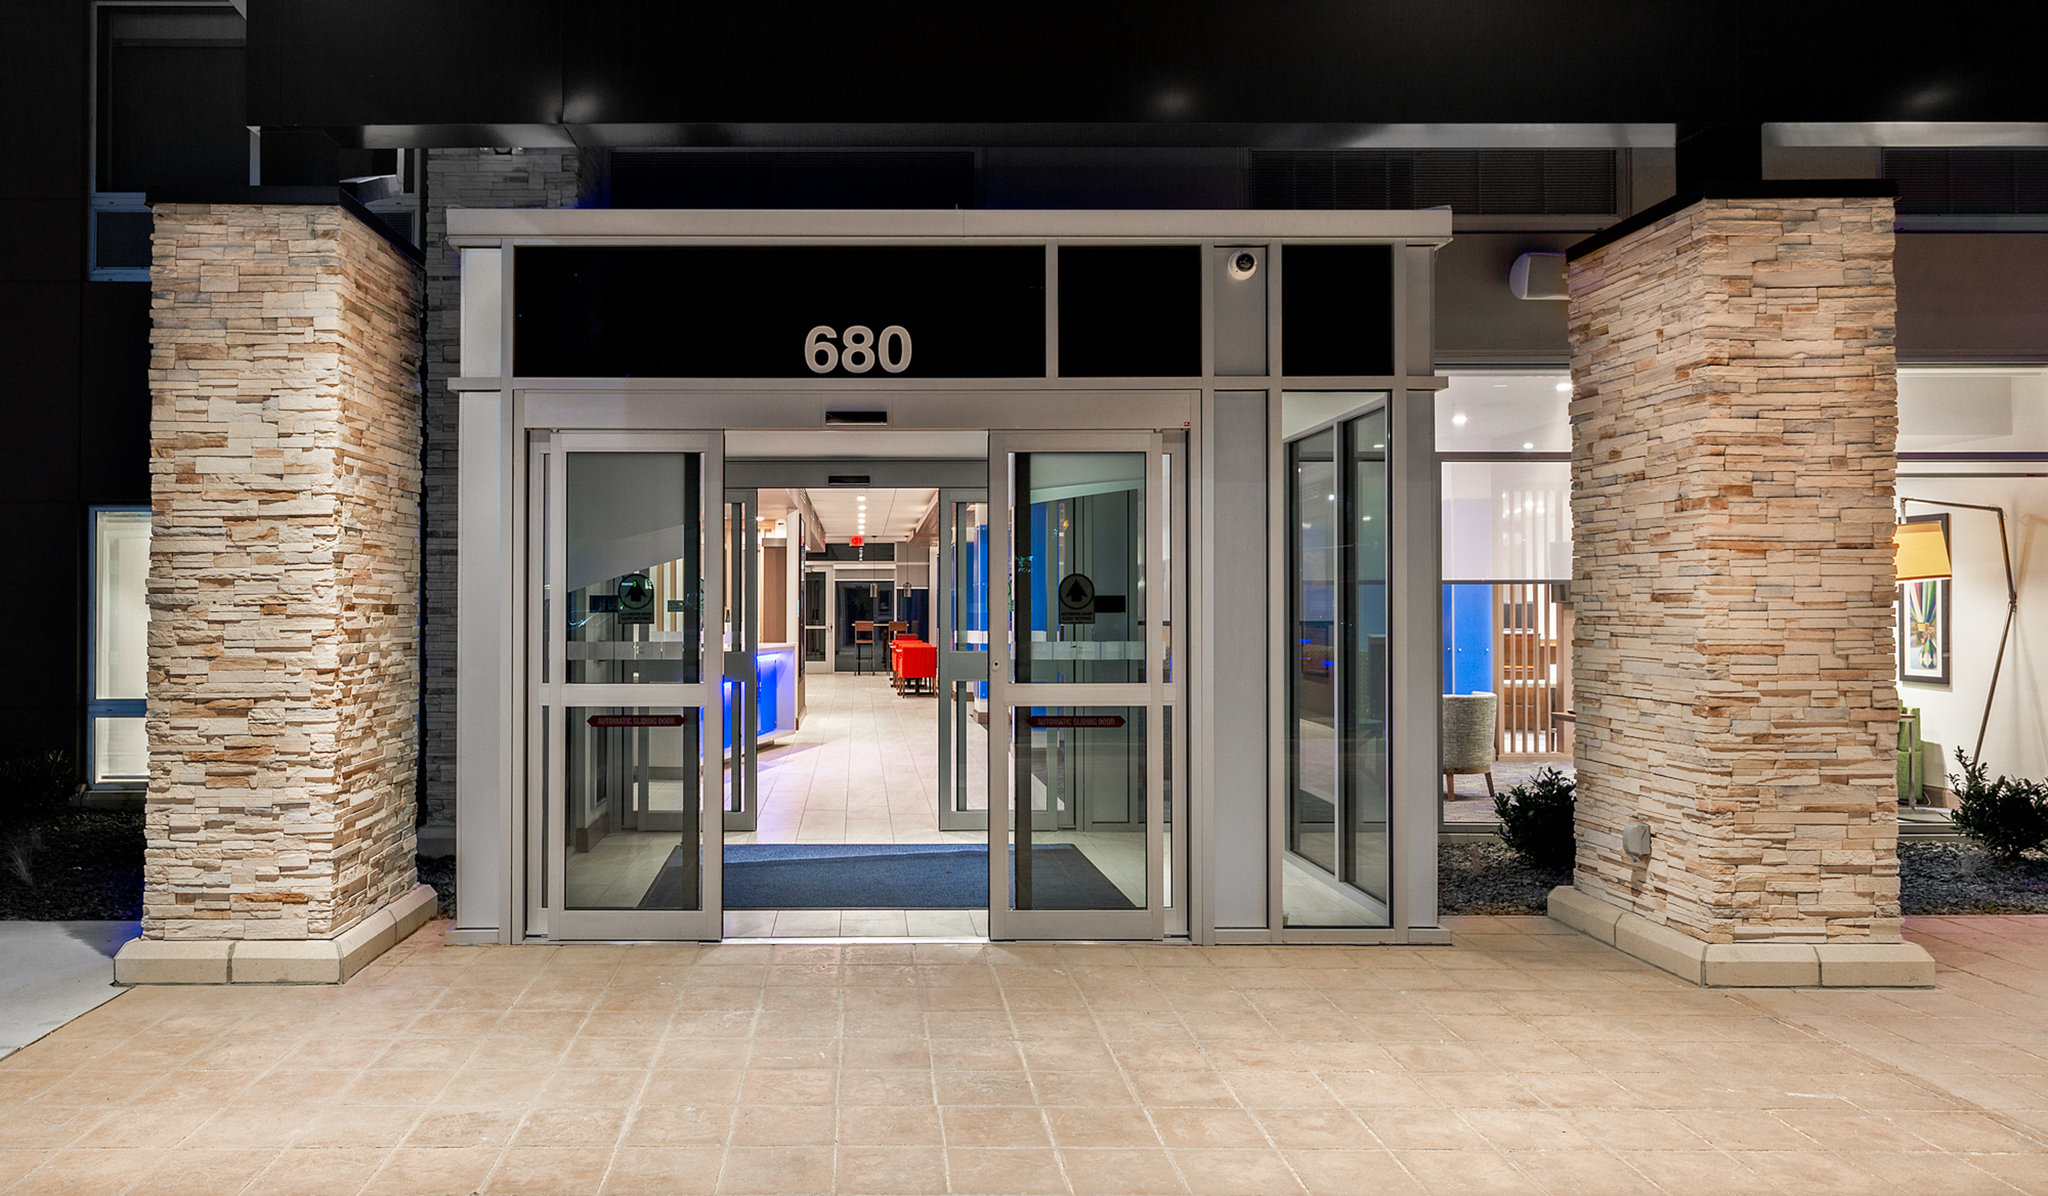 Holiday Inn Express & Suites Prosser